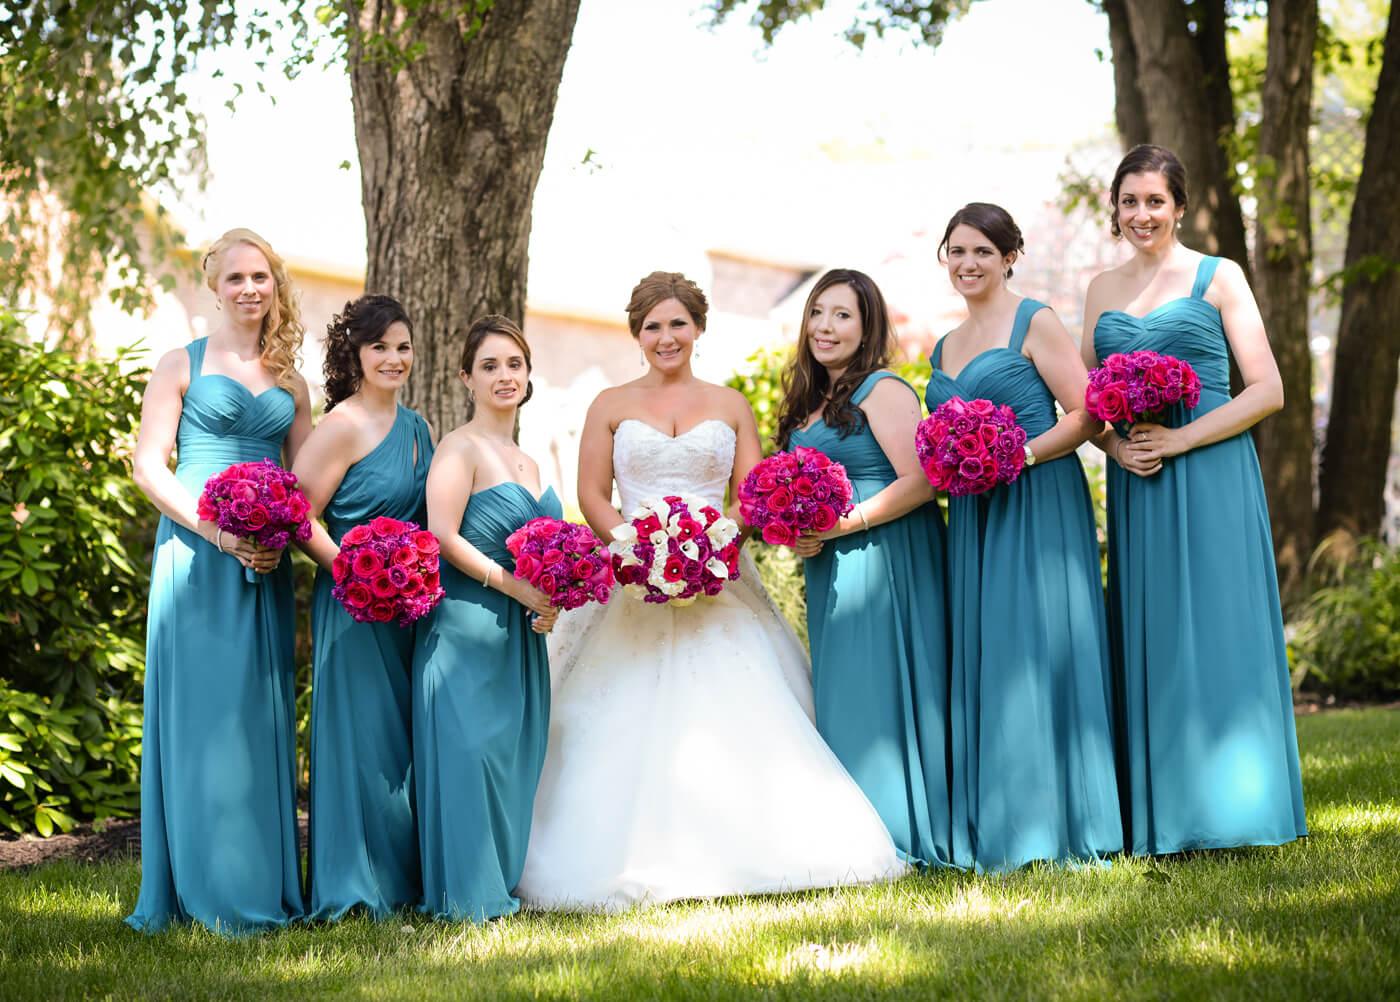 Brautjungfernkleider Blau